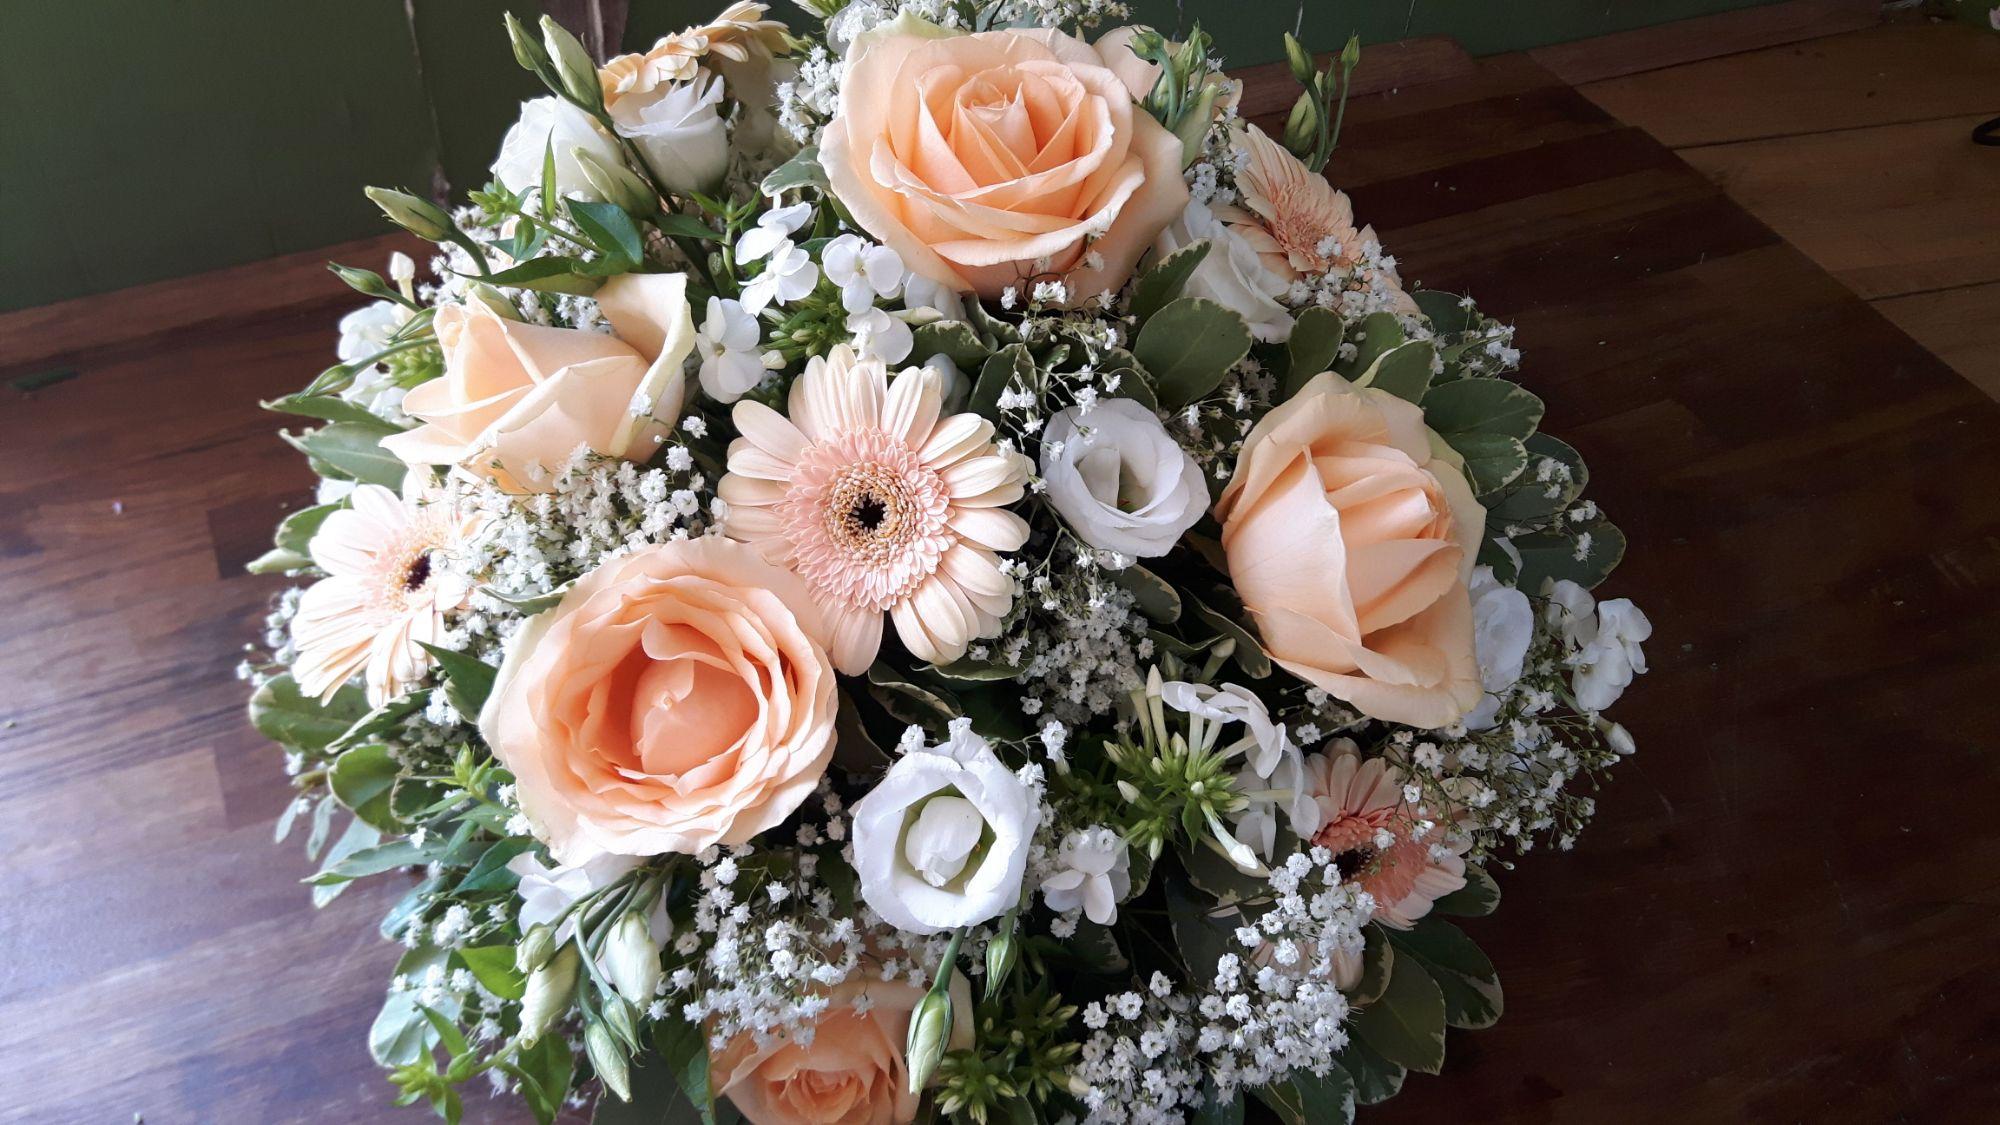 posy arrangement funeral flowers